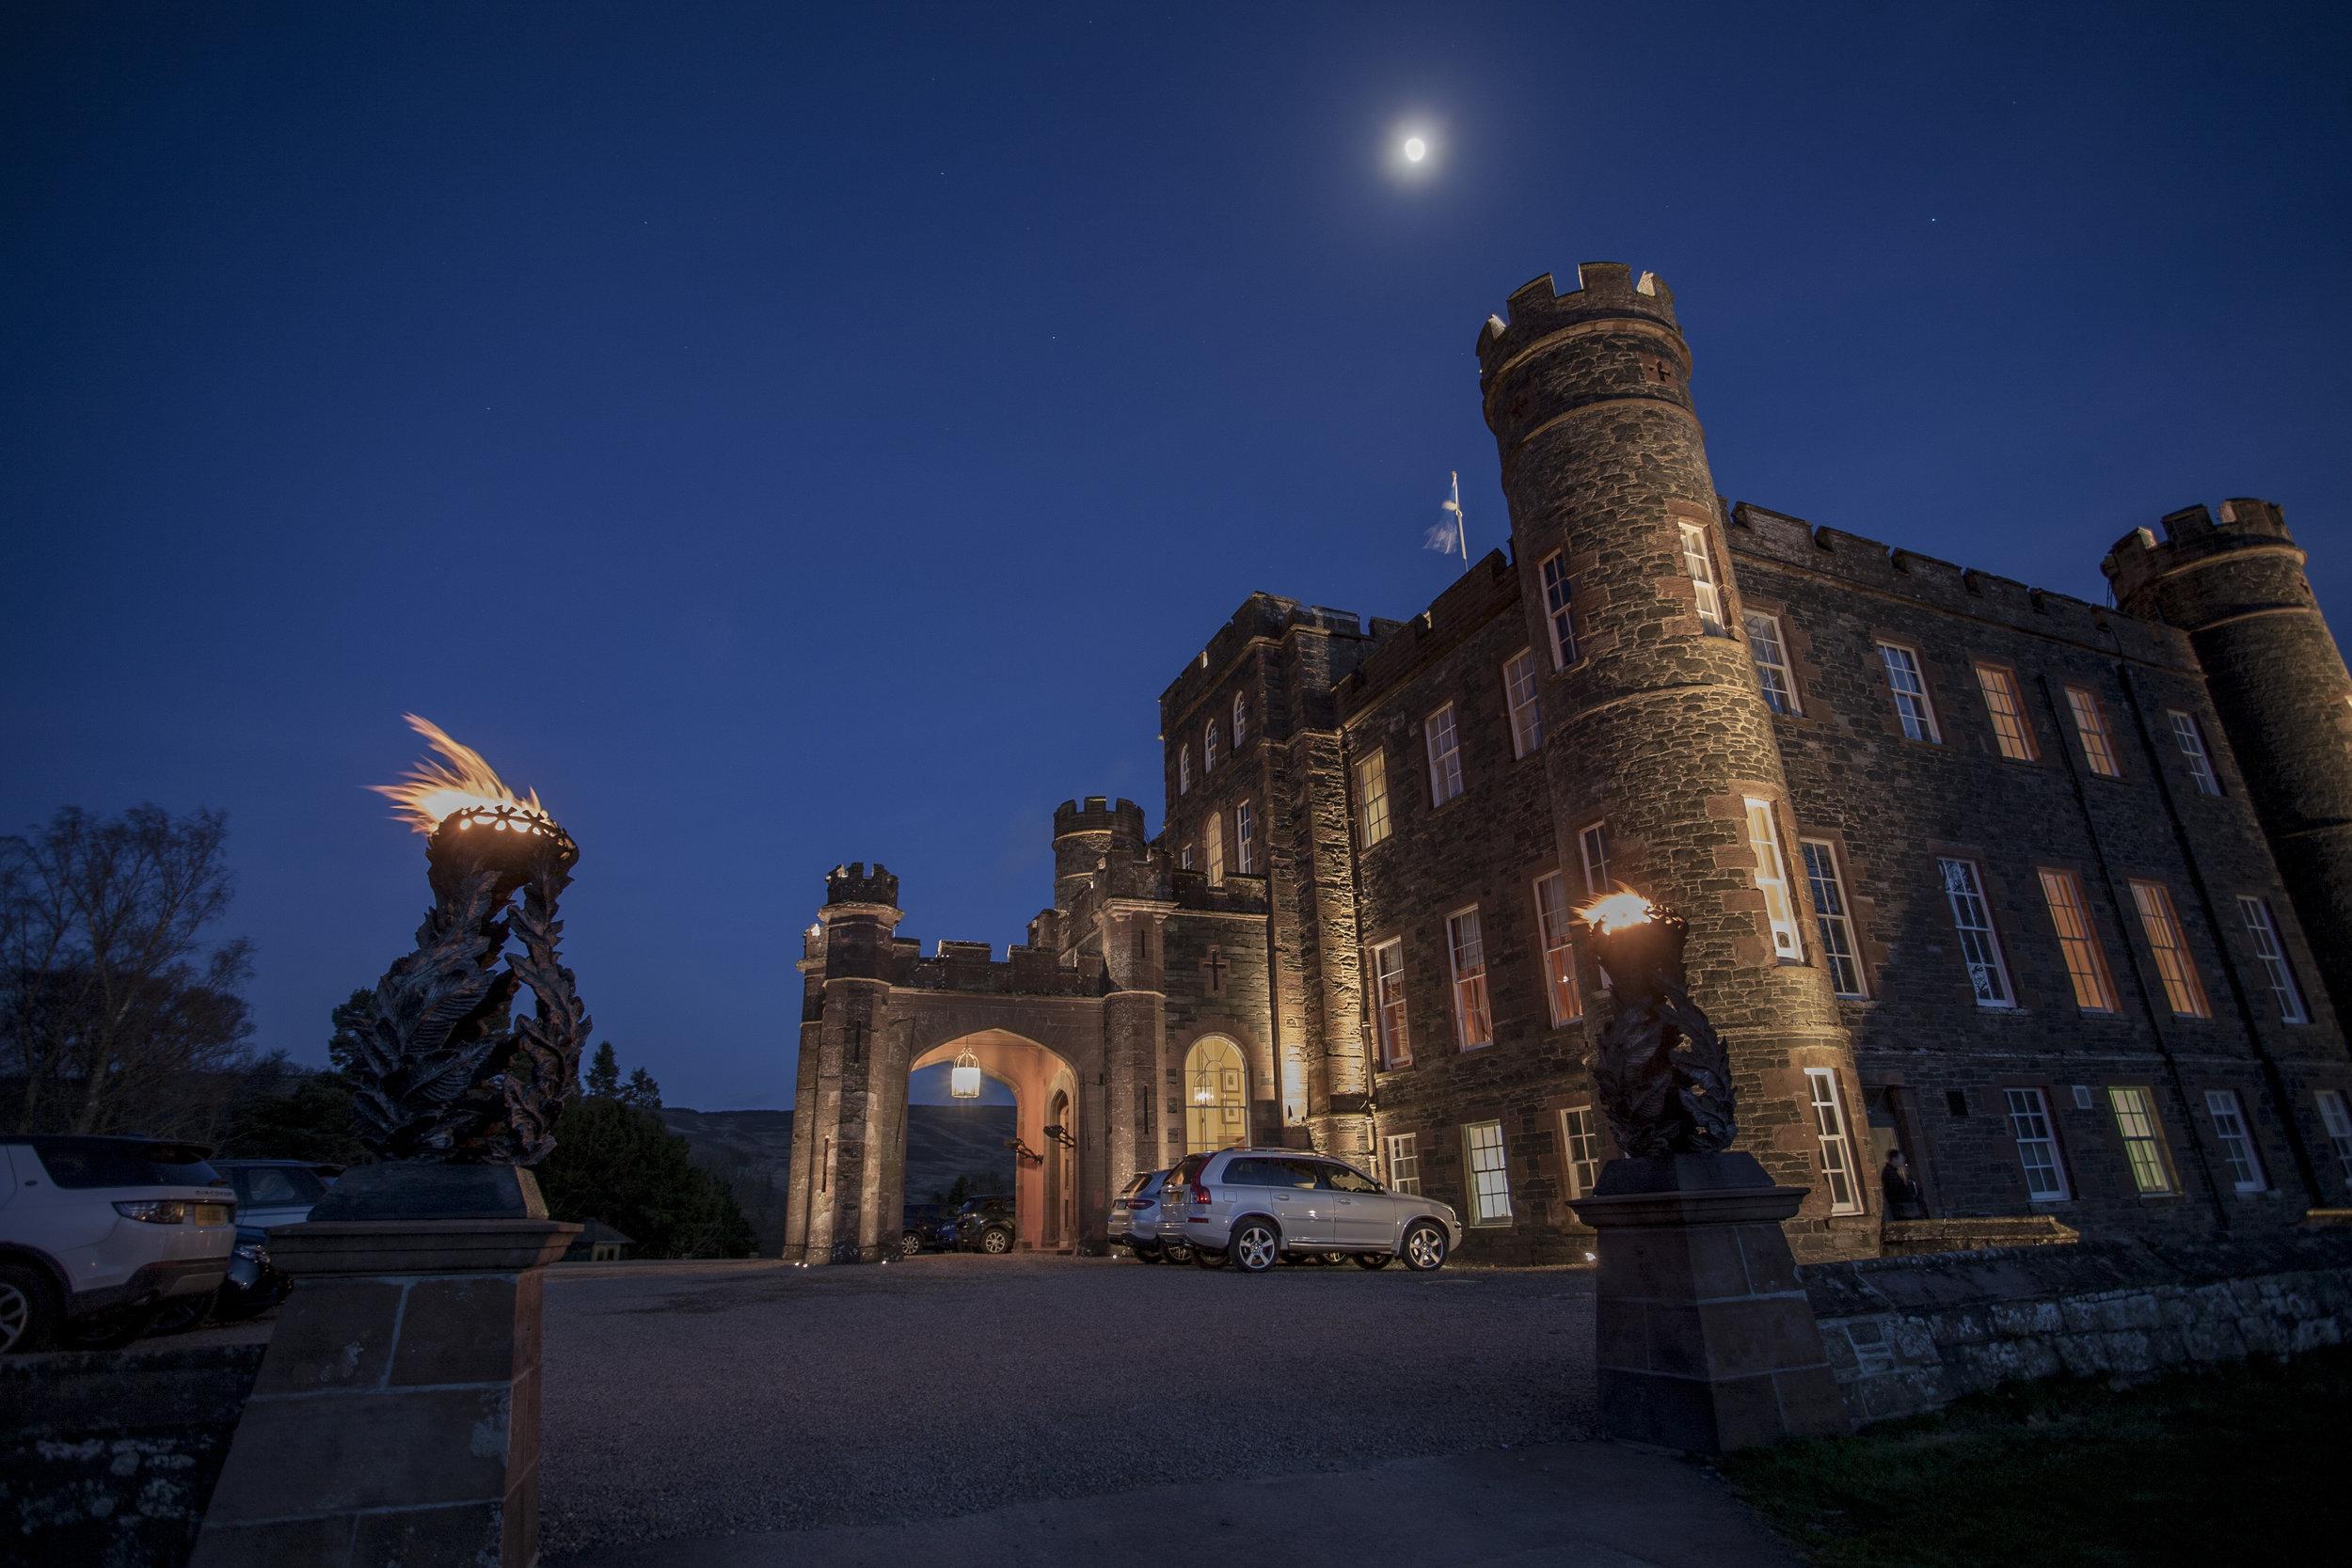 Stobo Castle